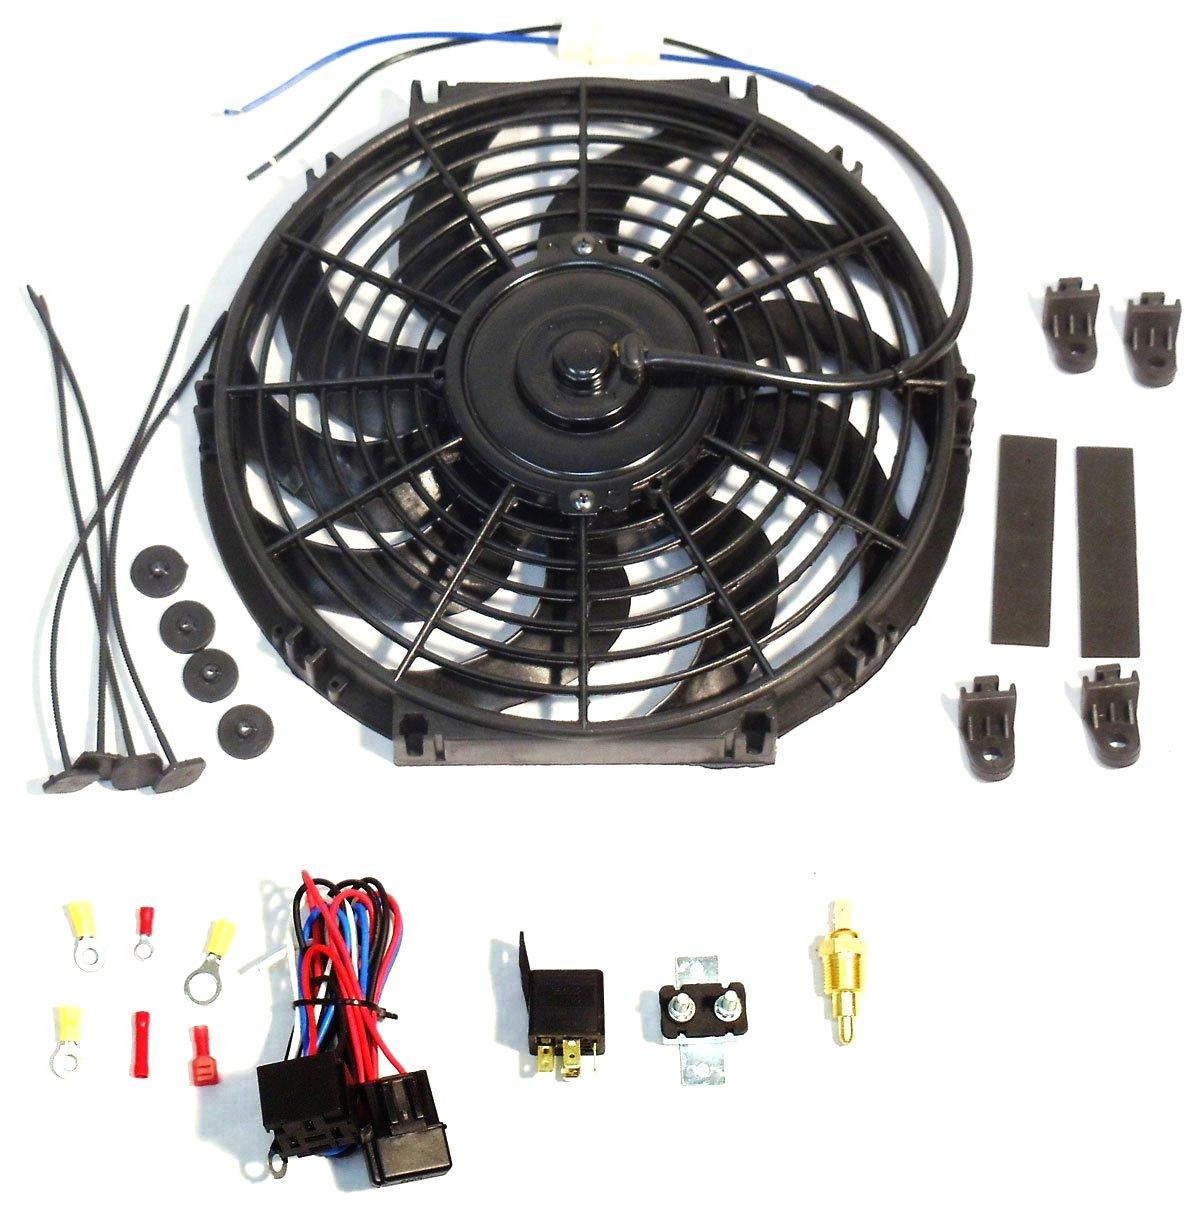 16' Electric Curved Blade Reversible Cooling Fan 12v 3000 CFM with Thermostat Kit DEMOTOR DER-PC453+PE032